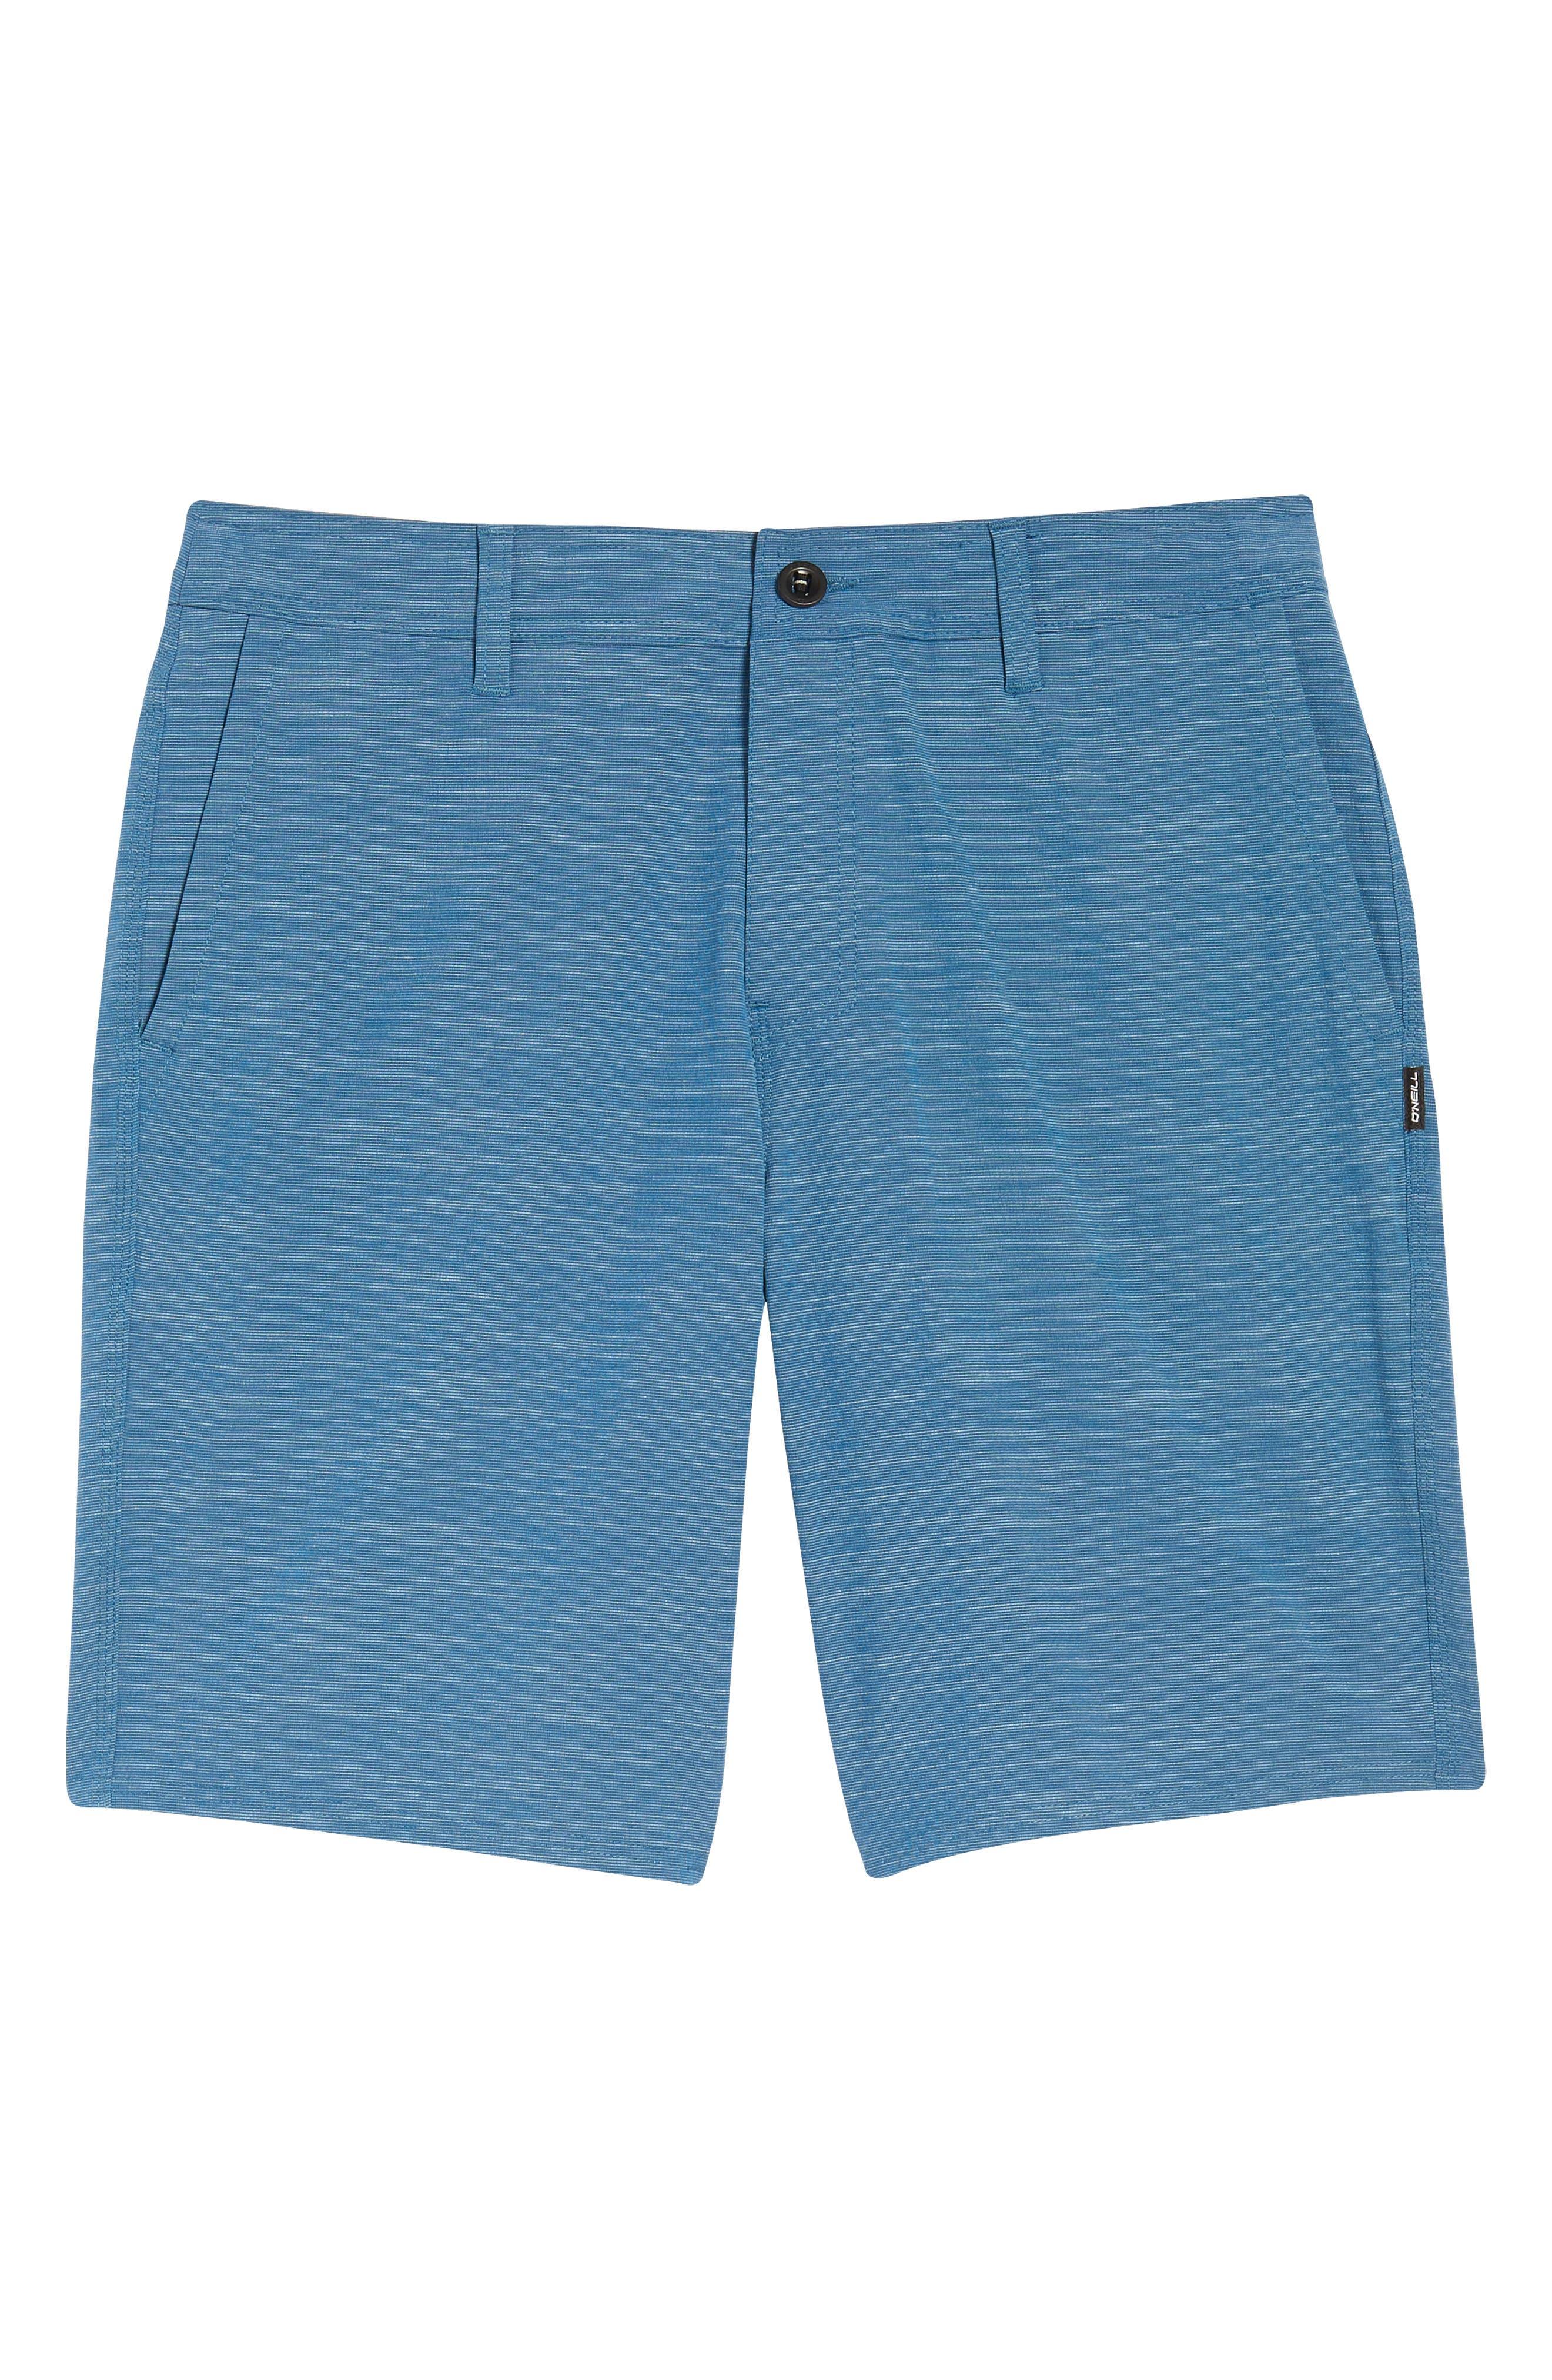 Locked Slub Hybrid Shorts,                             Alternate thumbnail 6, color,                             Air Force Blue